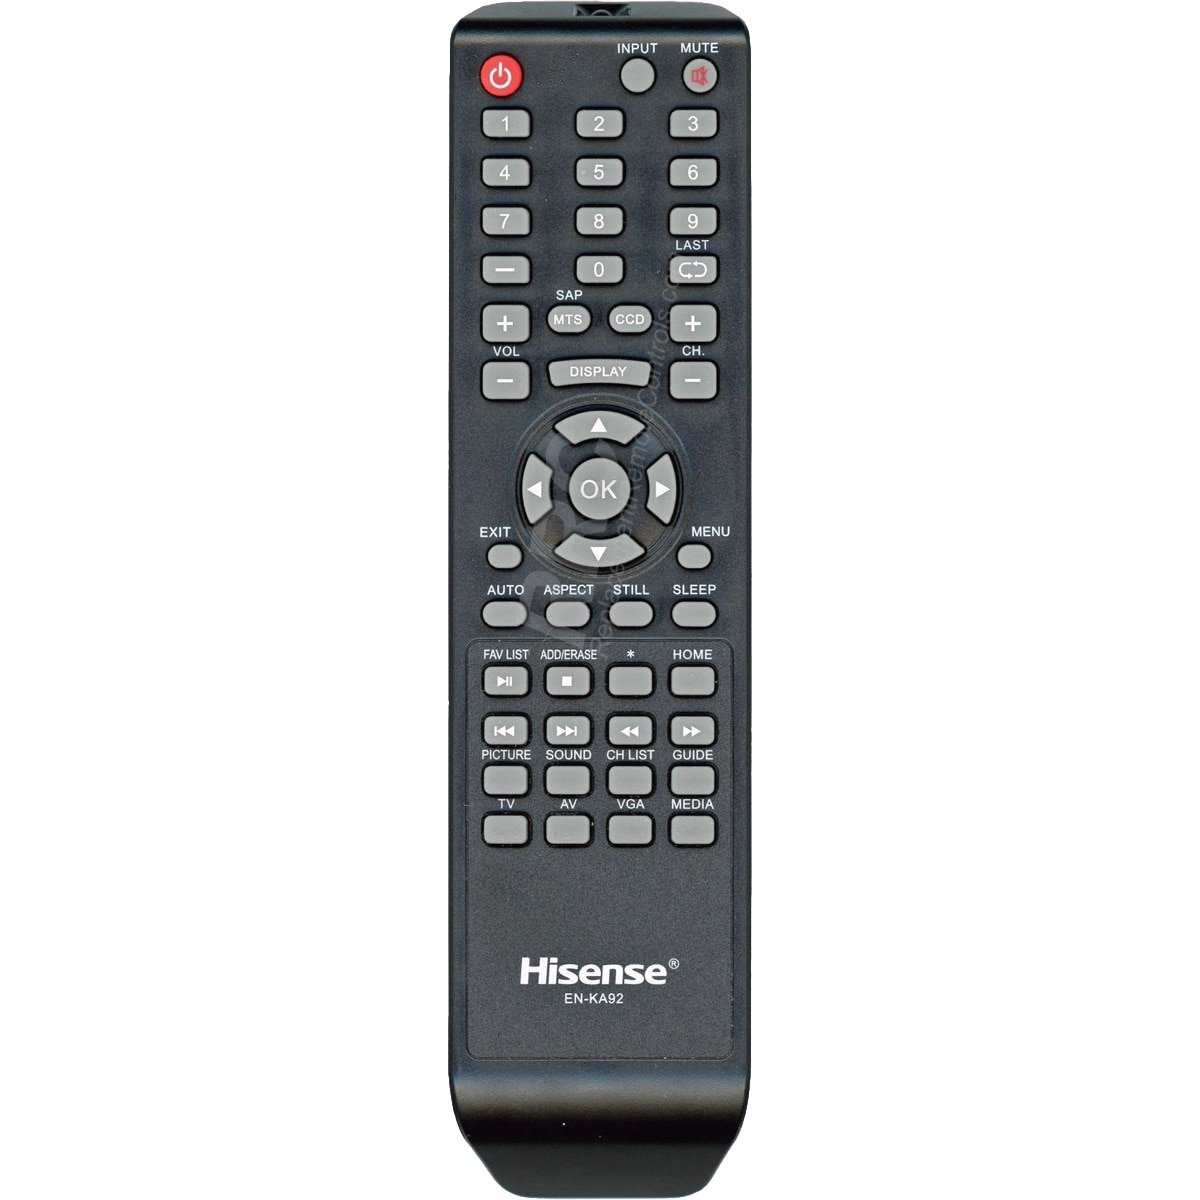 Control Remoto Hisense TV EN KA92 H3 Series led TV  Works...